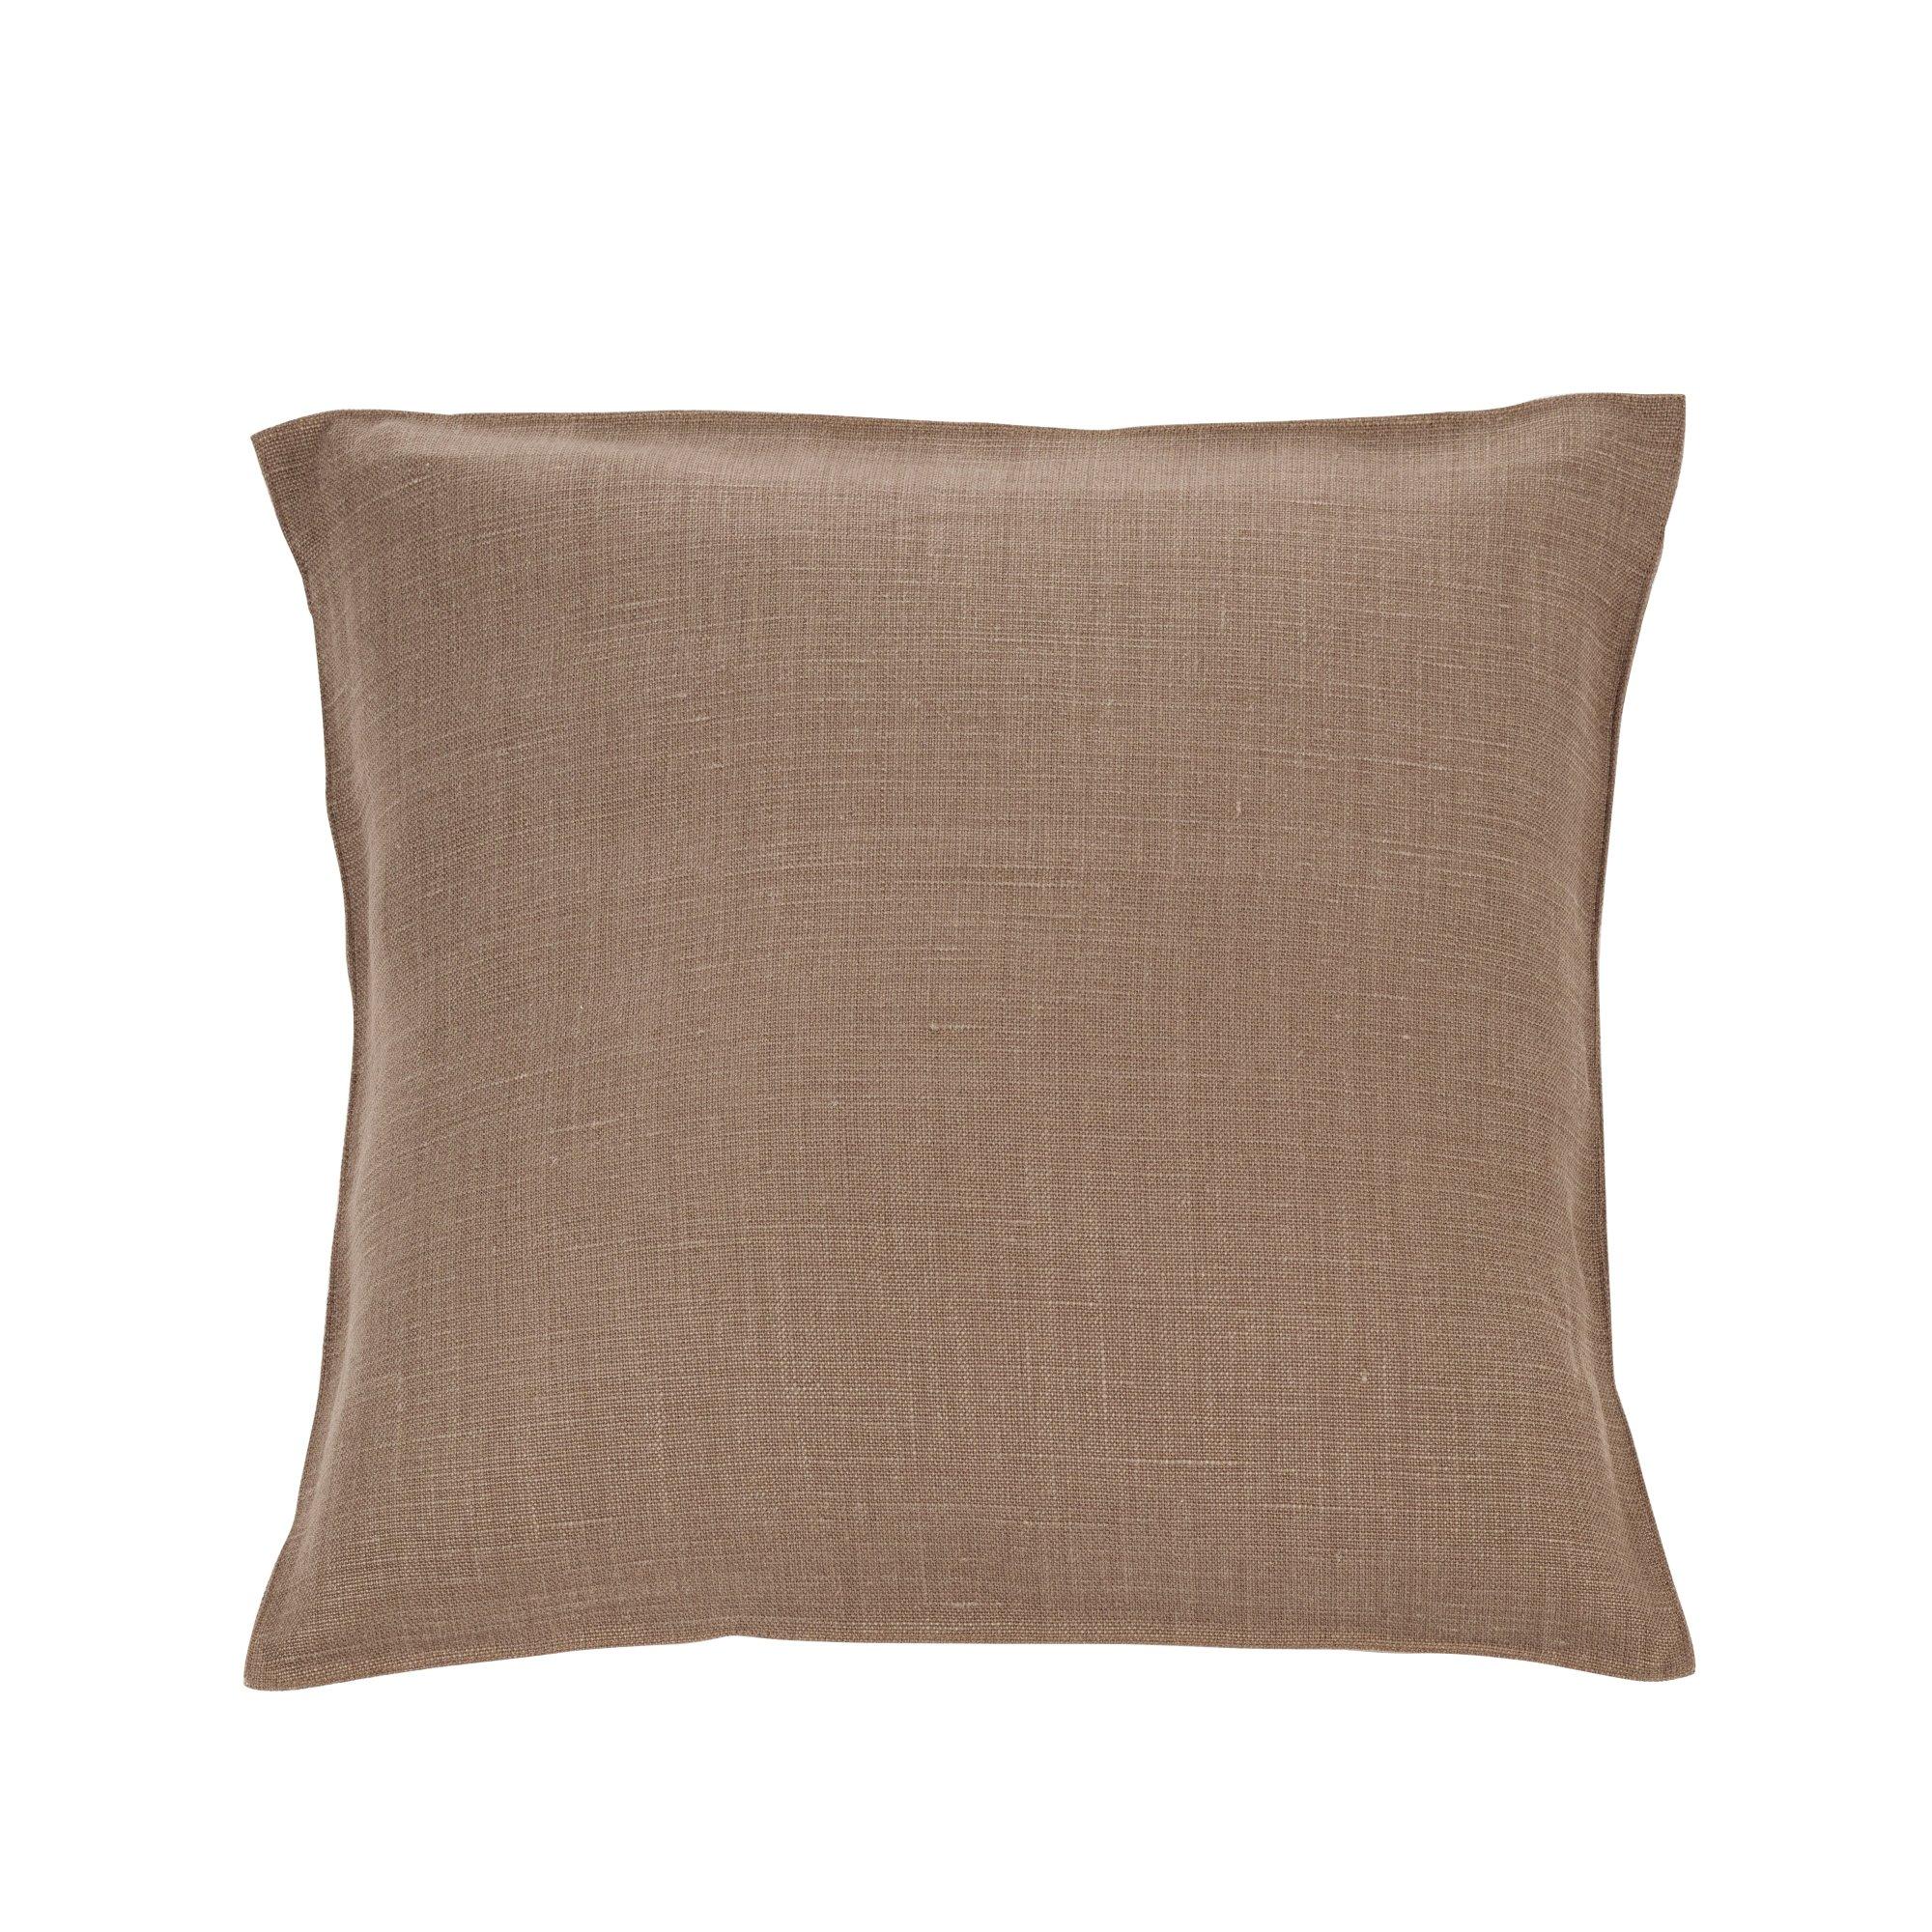 Napoli Vintage Pillow Cover